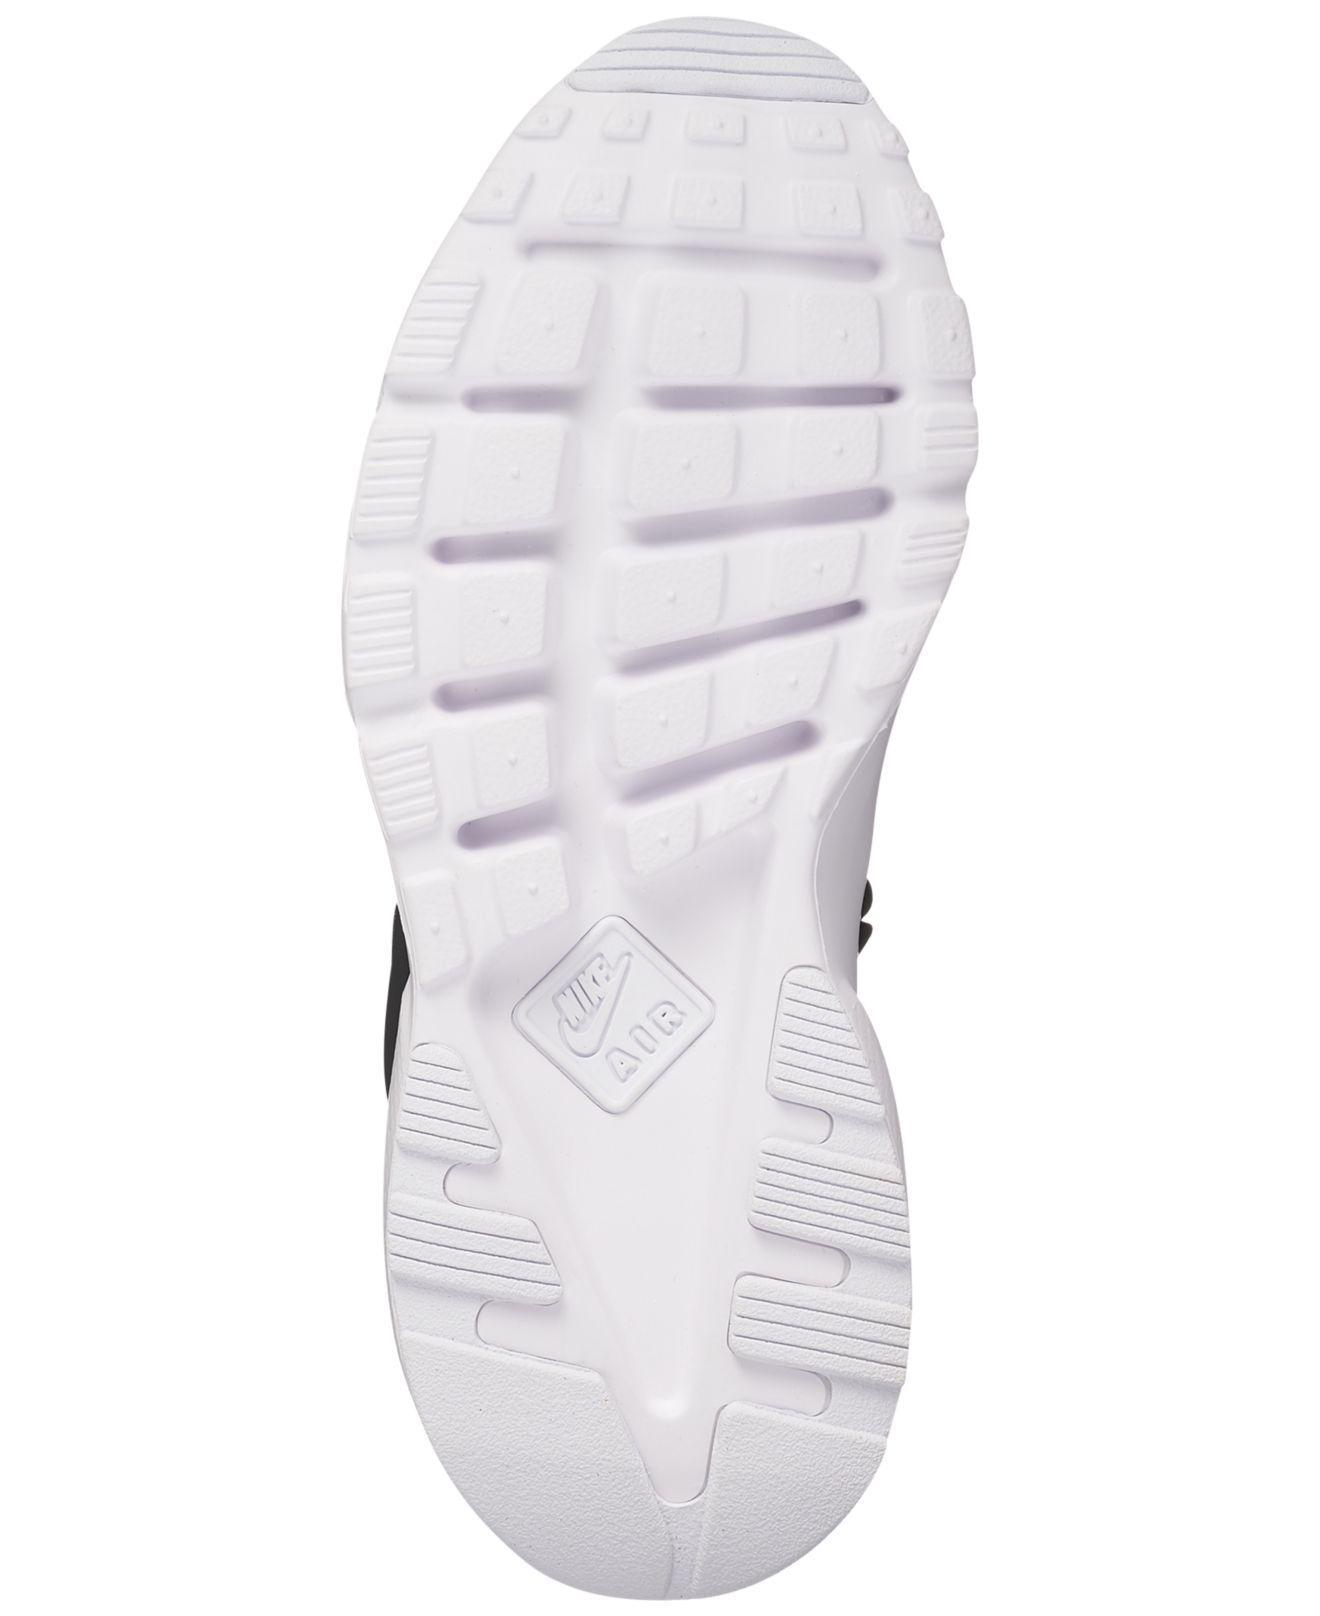 e1debf568dacb Lyst - Nike Men s Air Huarache Run Ultra Casual Sneakers From Finish Line  in Black for Men